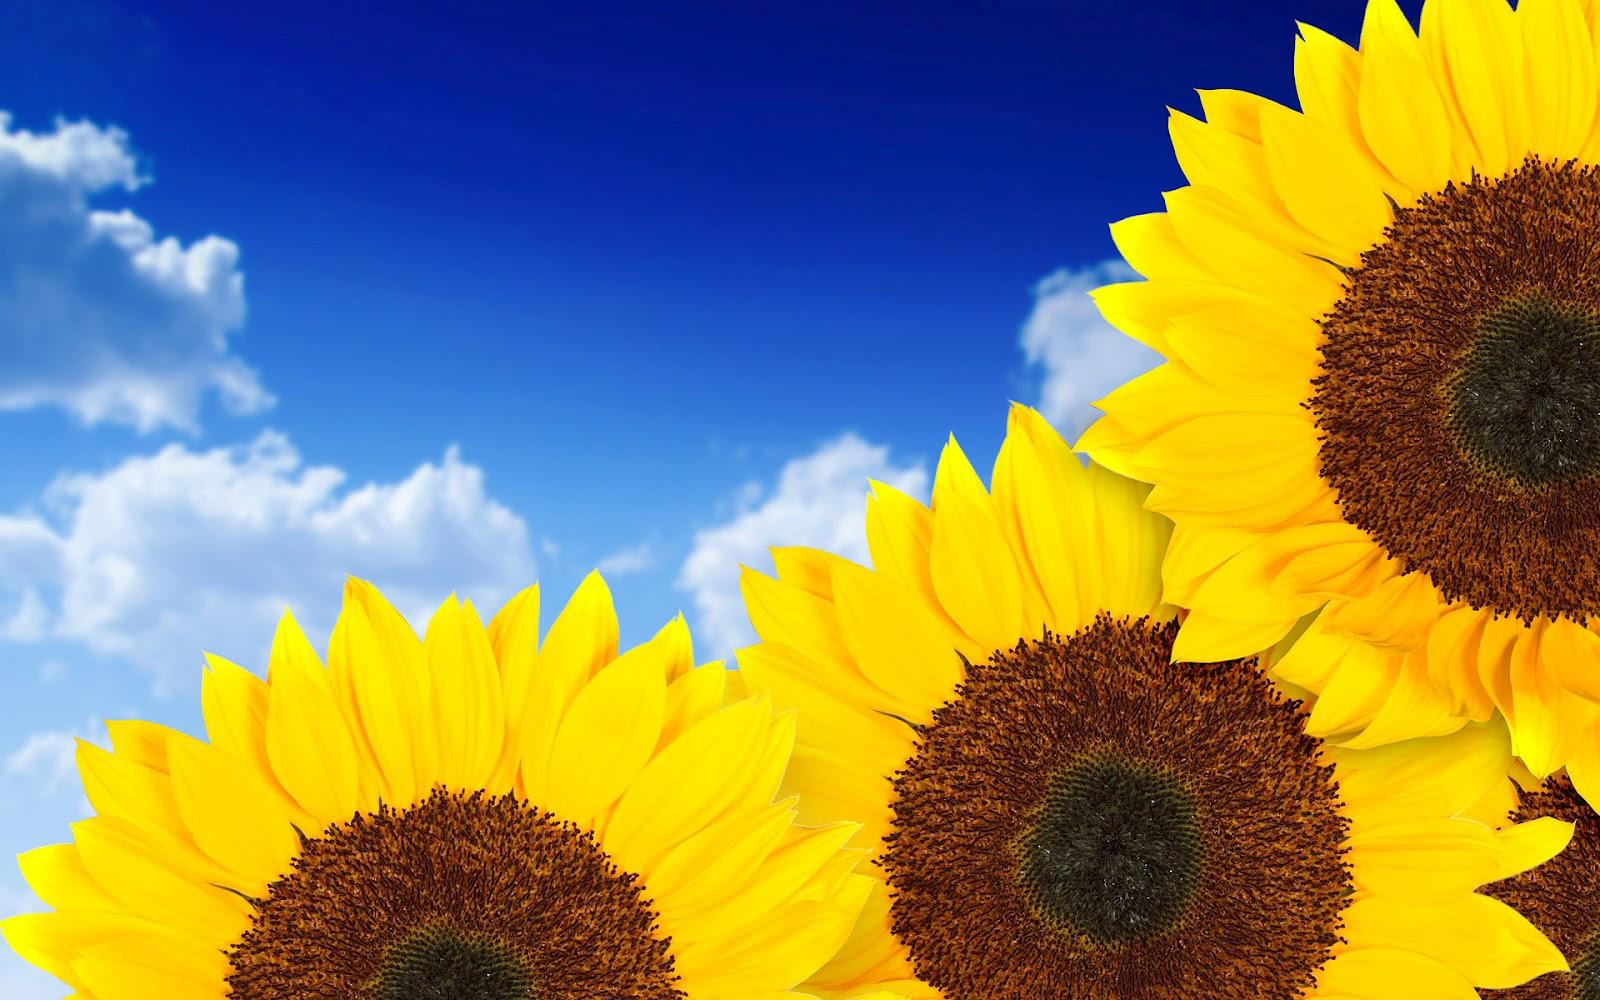 Sunflower Desktop Wallpaper - WallpaperSafari